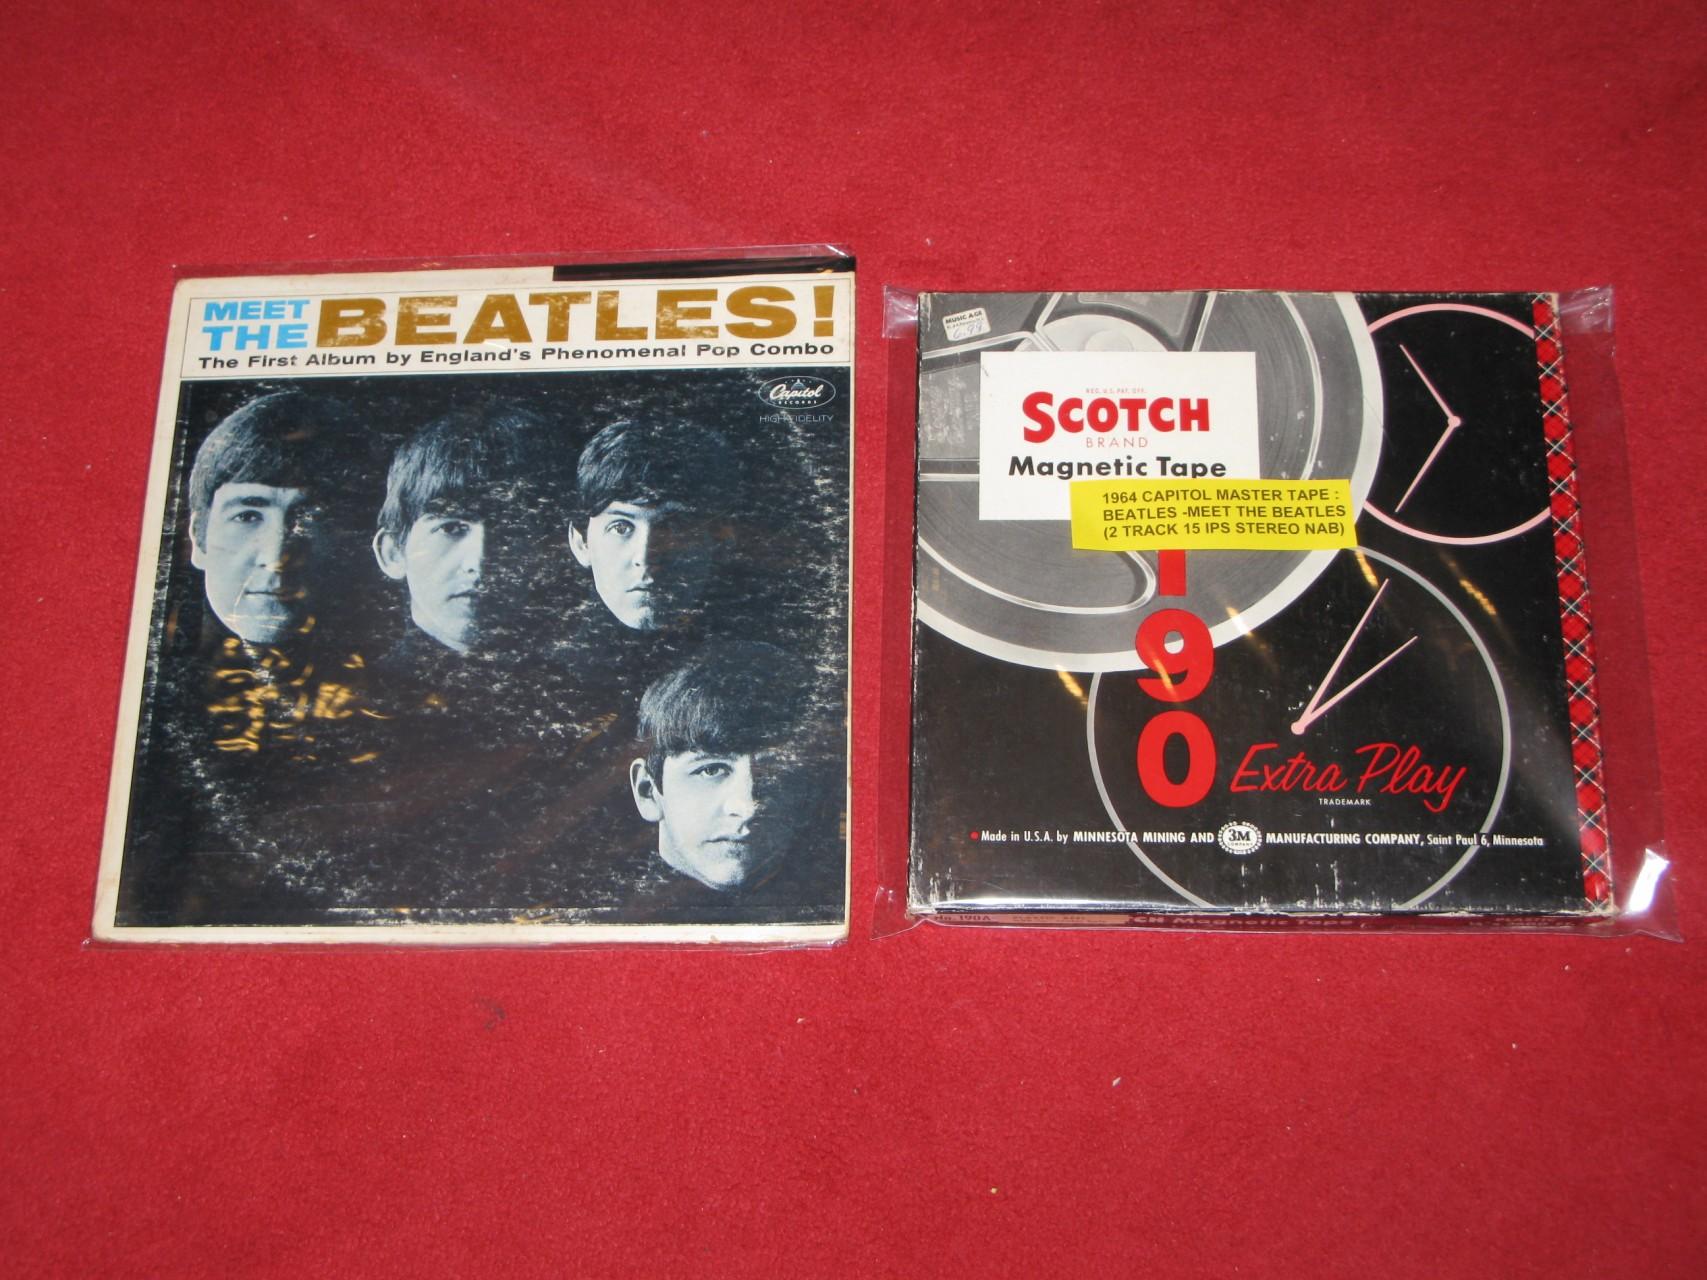 BEatles - Meet the Beatles stereo 母帶